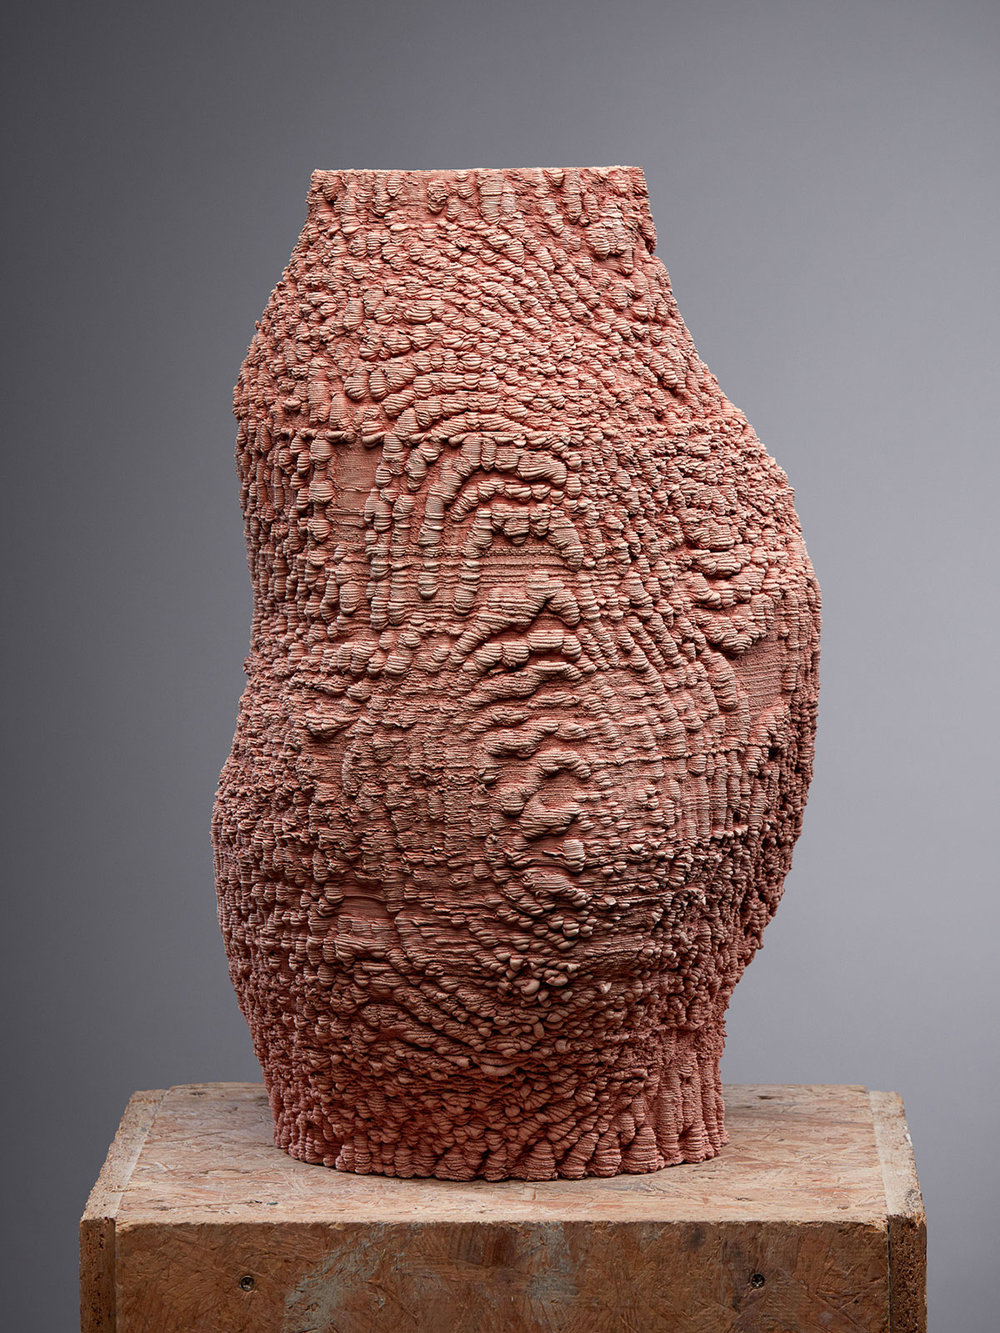 3d-print-ceramic-object-herpt-wassink.jpg